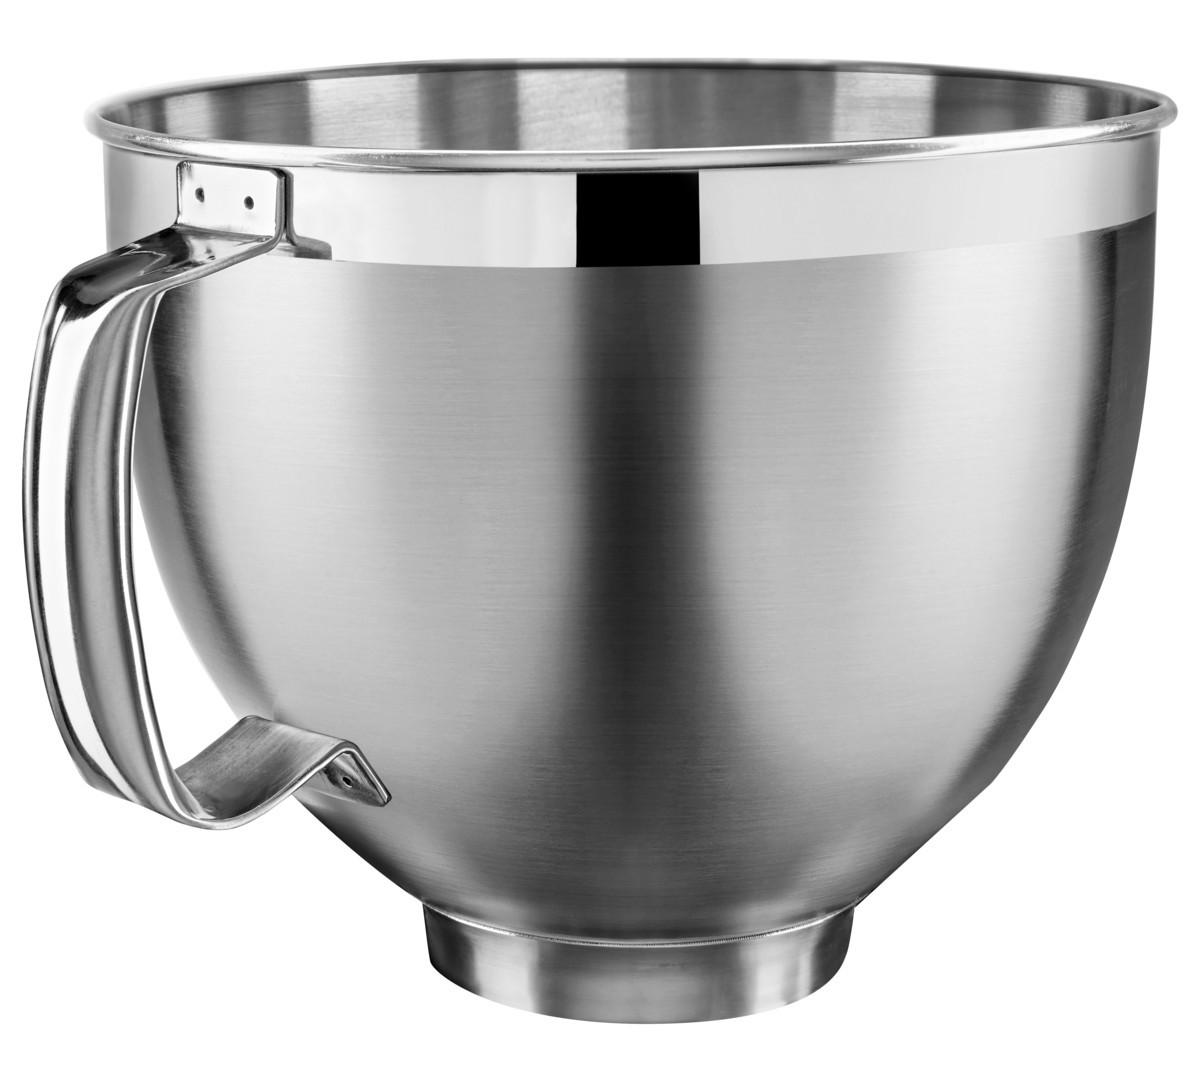 KitchenAid 4,8-Liter Edelstahlschüssel 185er-Modelle